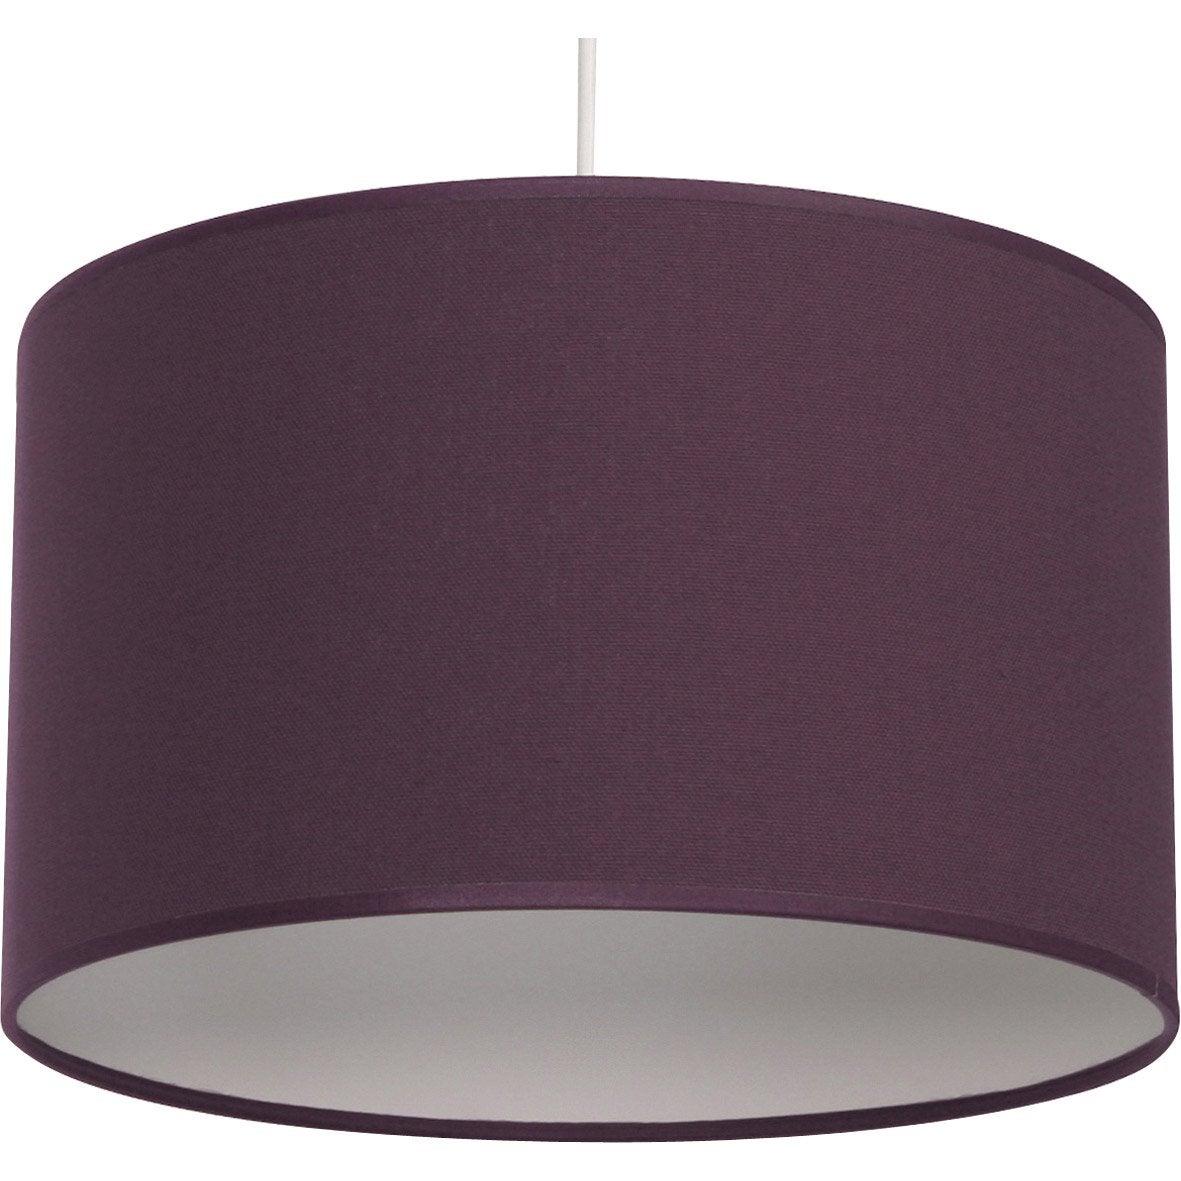 Suspension e27 natt coton violet violet n 2 1 x 60 w inspire leroy merlin - Abat jour suspension leroy merlin ...